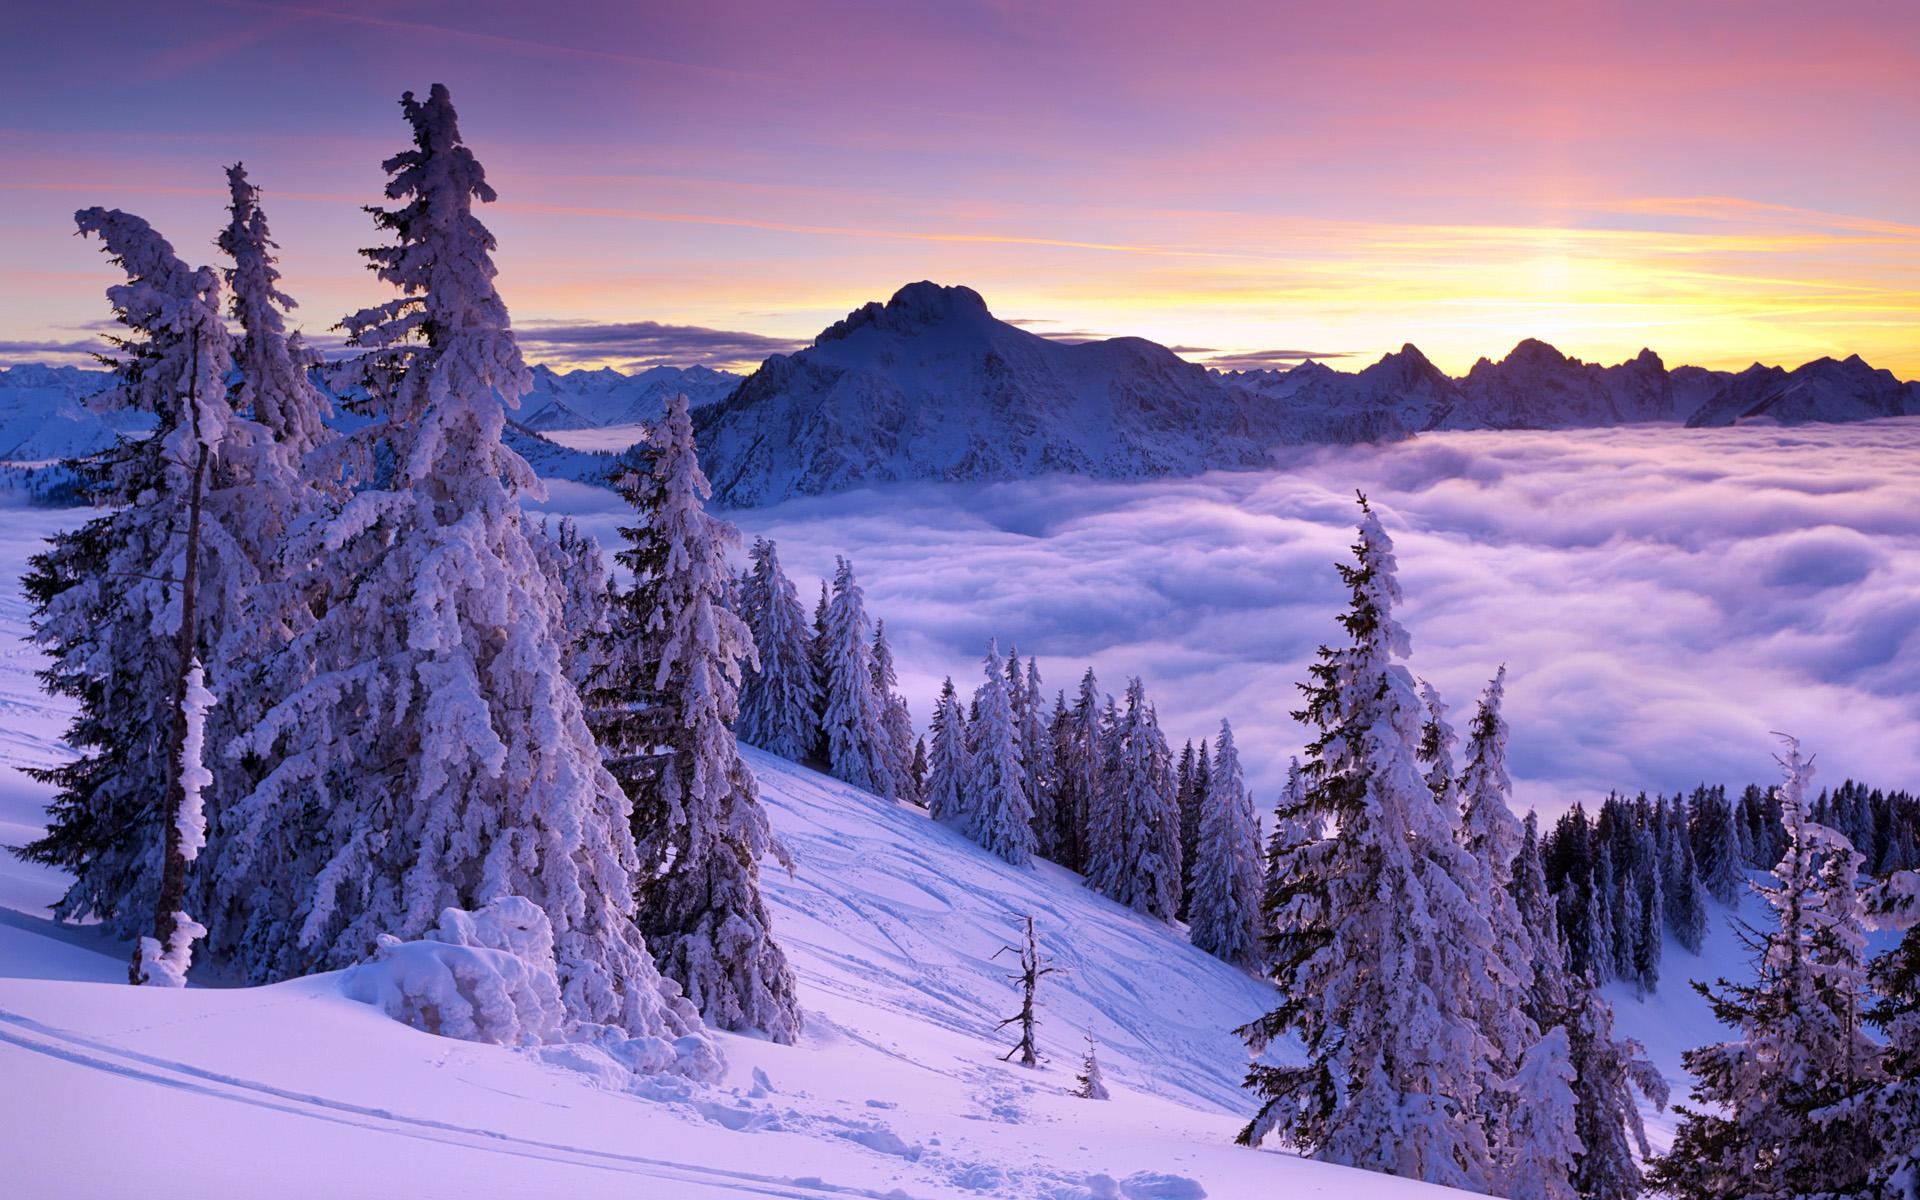 Purple Winter Sunset Wallpapers HD Wallpapers 1920x1200